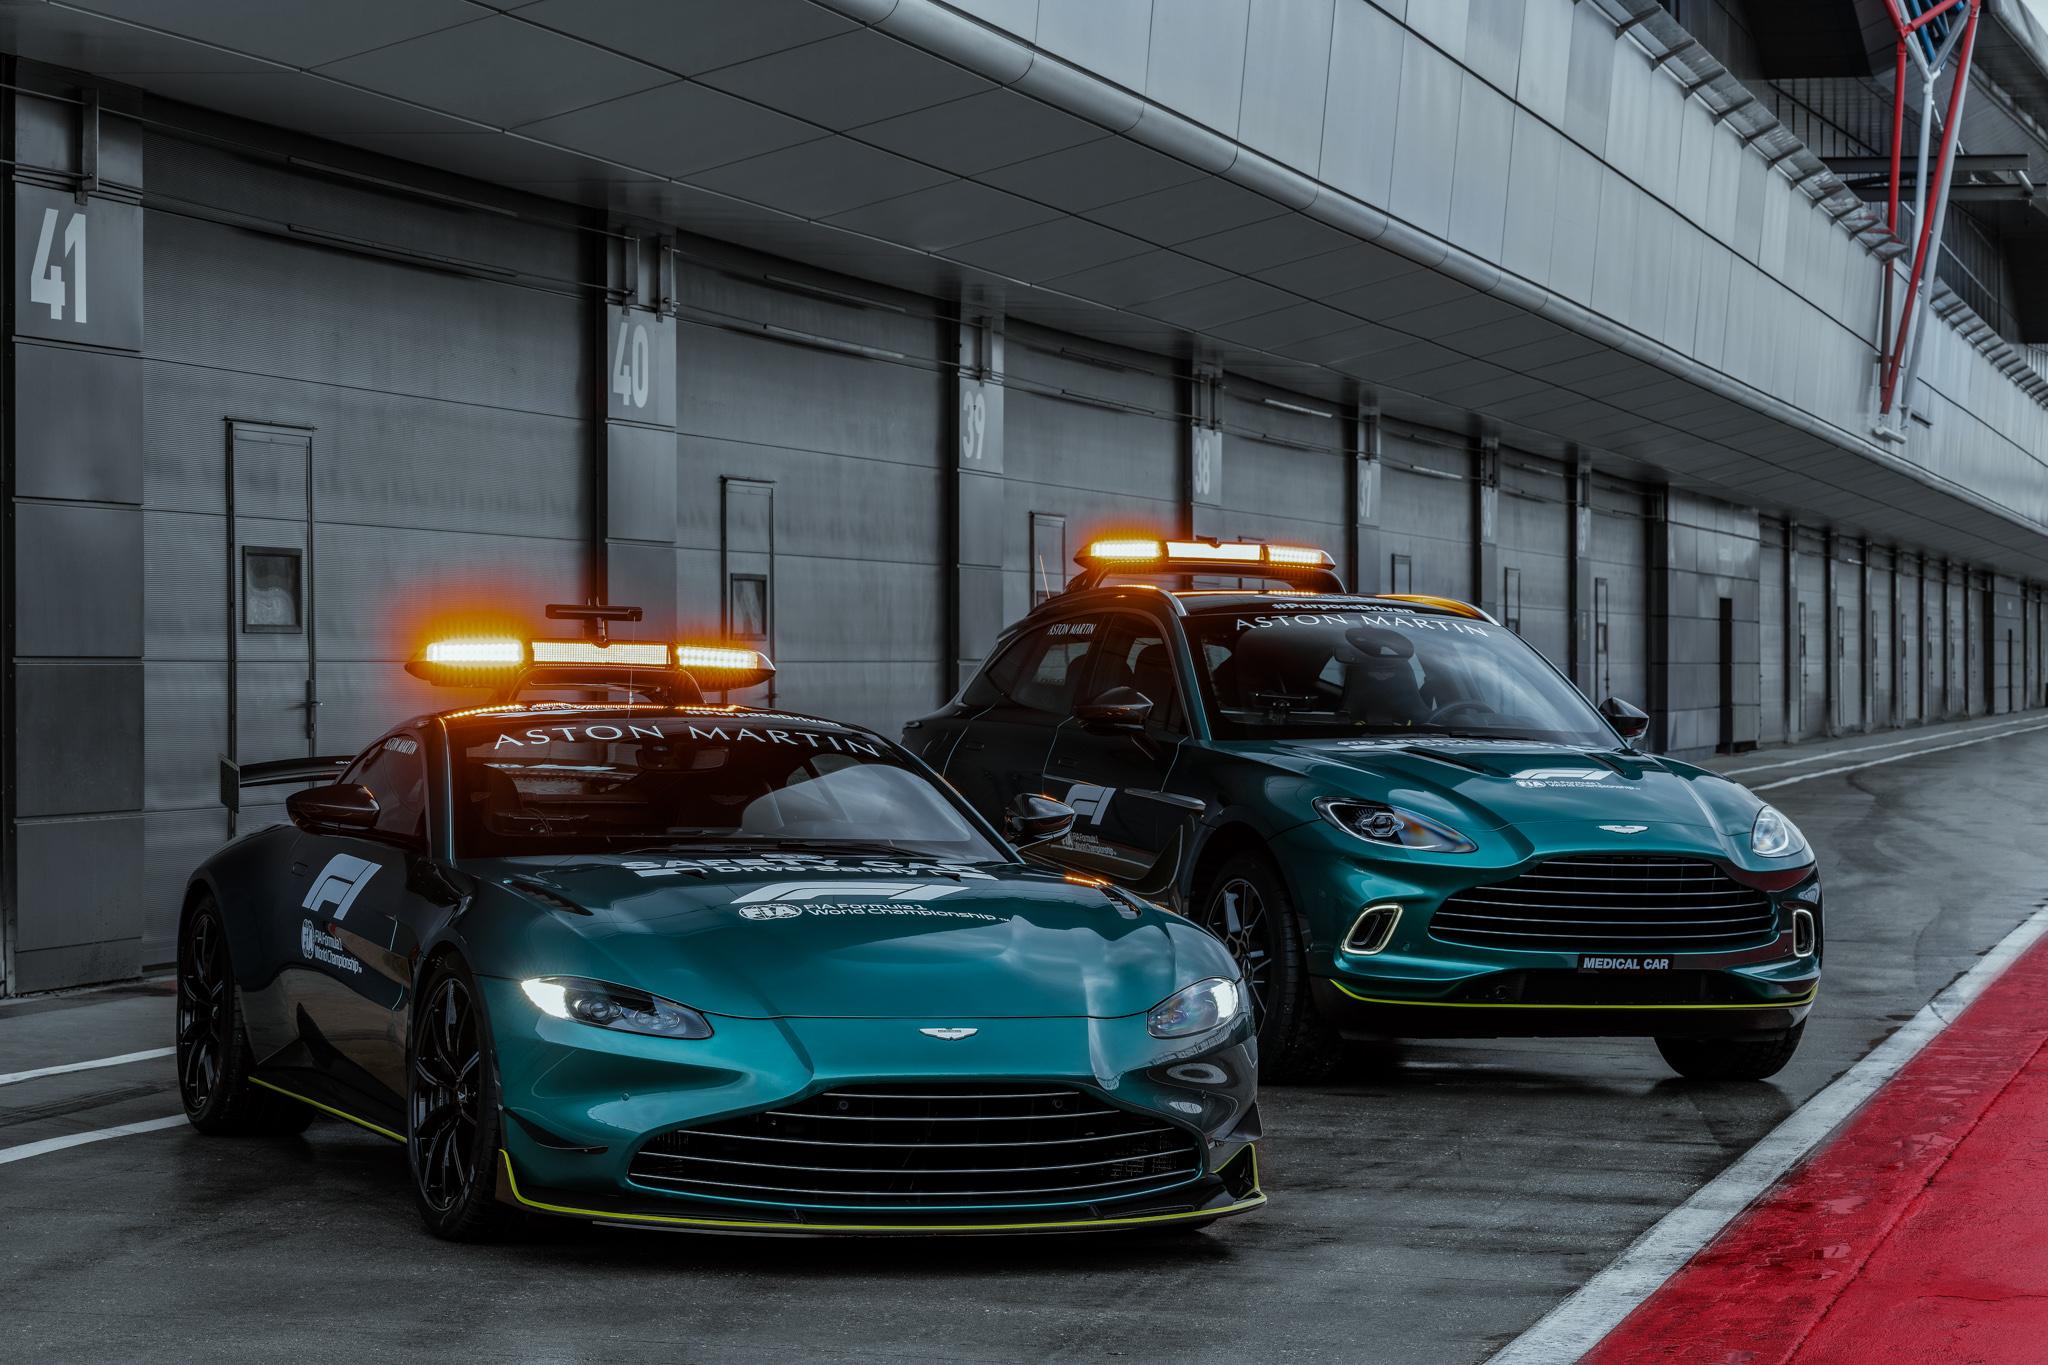 Aston Martin safety and medical car